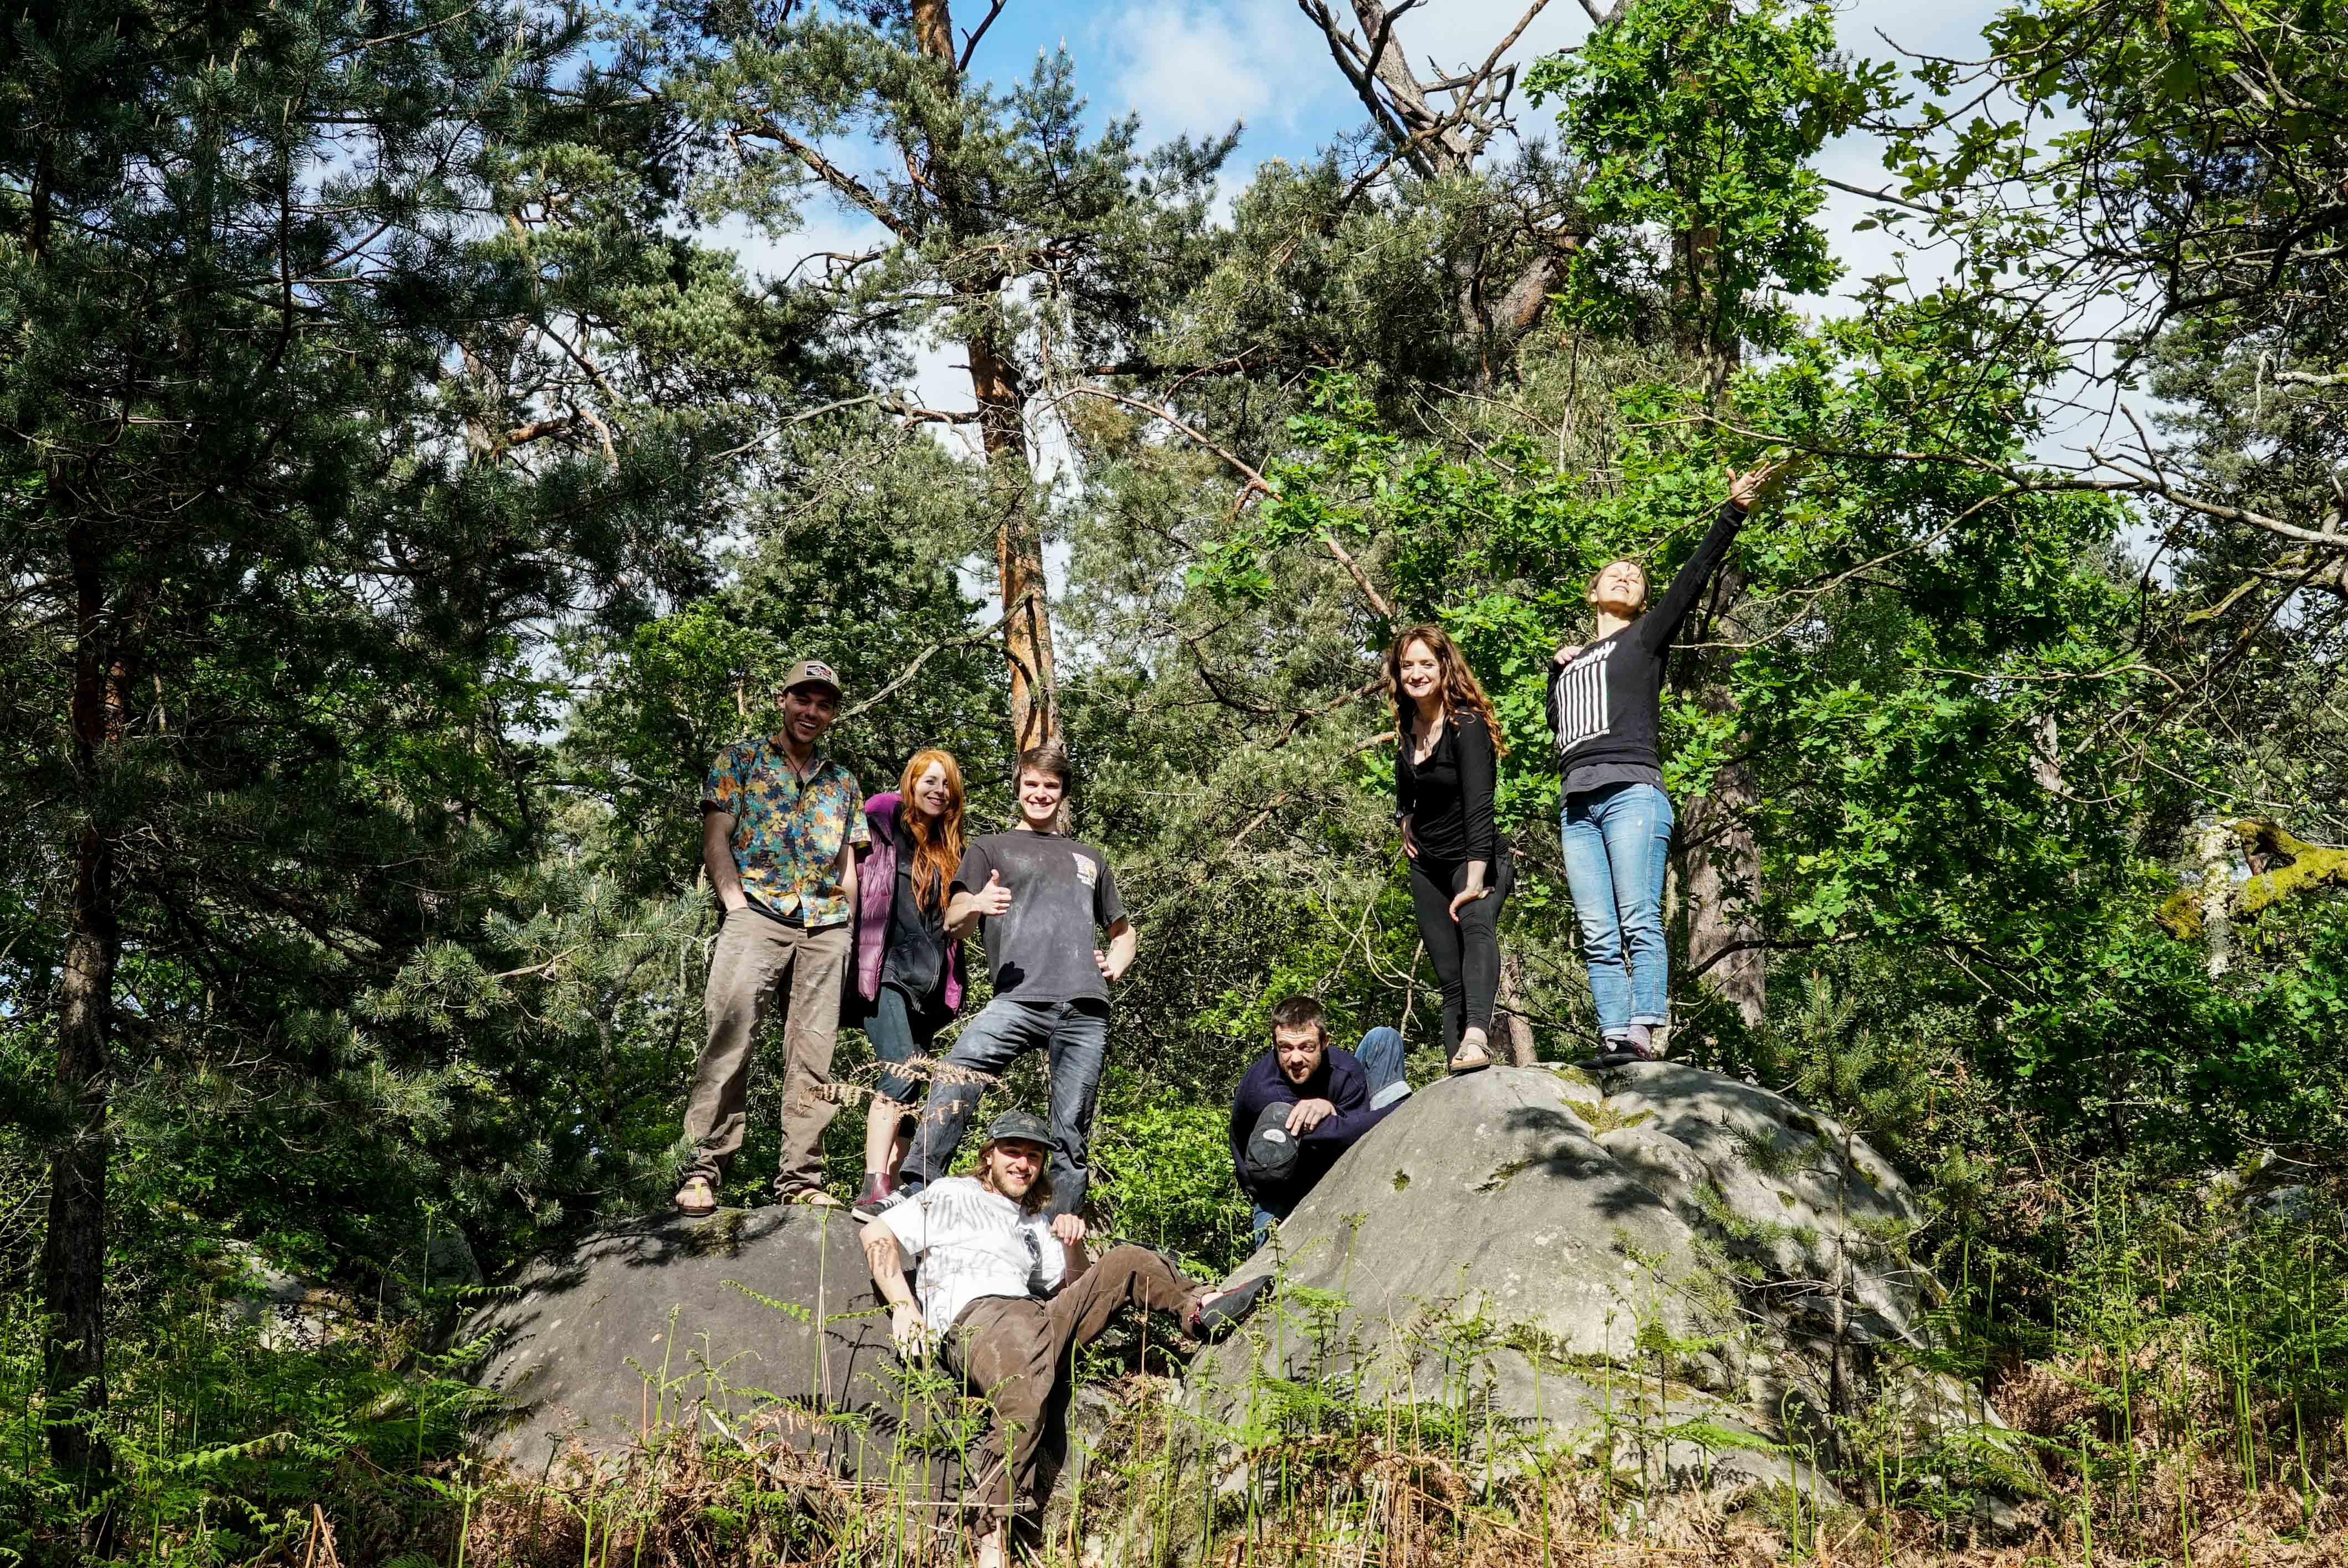 fontainbleau climbing 2016 mike brindley-133